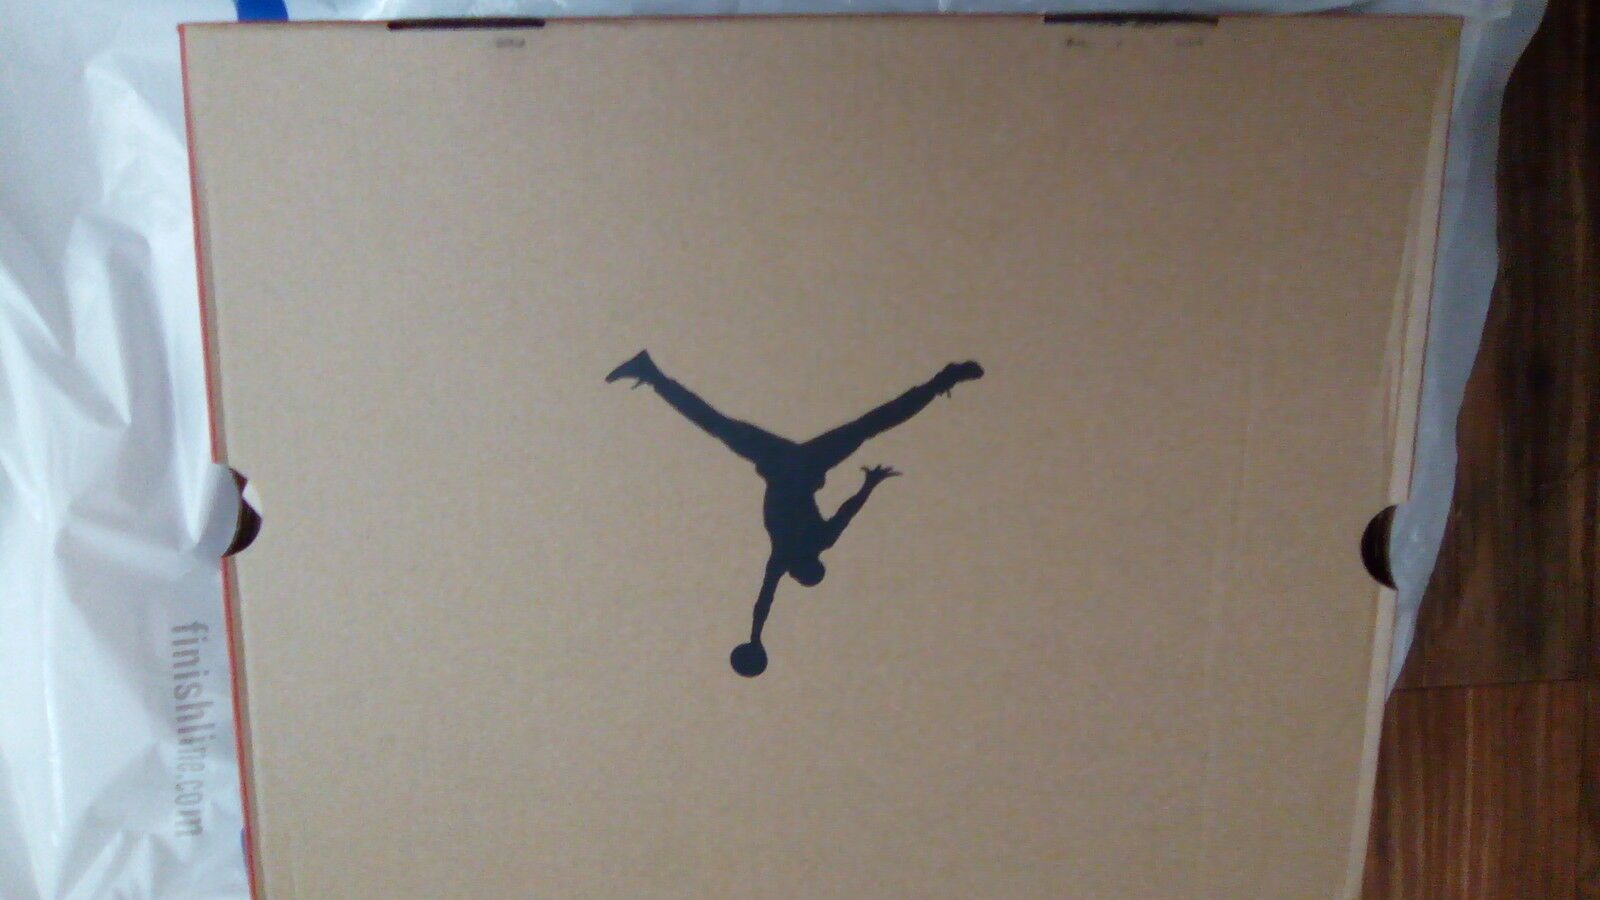 AIR JORDAN retro 12  THE MASTER  size 12